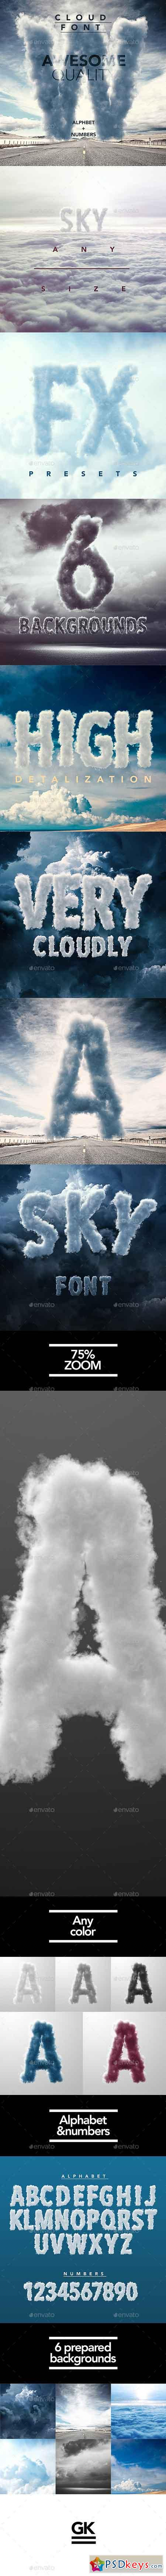 3D Sky Cloud Font Mock Up 12955563 » Free Download Photoshop